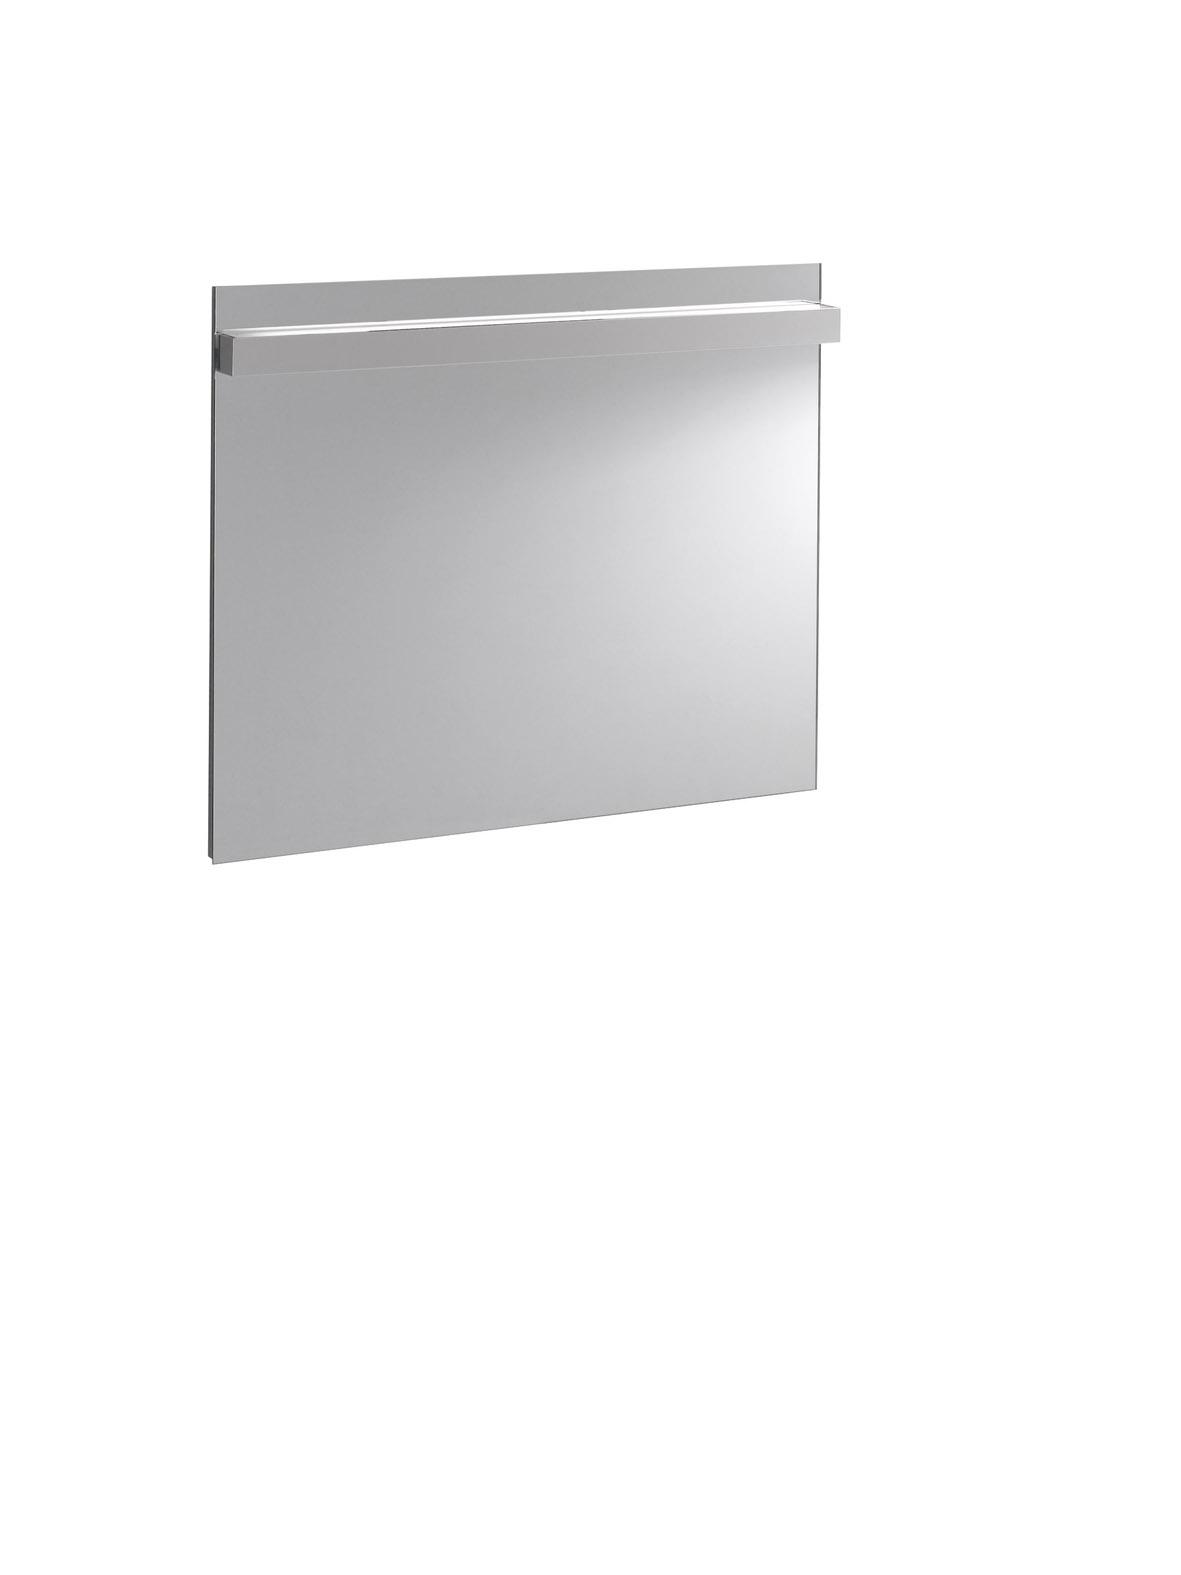 zrcadlo KERAMAG Icon zrcadlo s osvětlením 90x75 cm